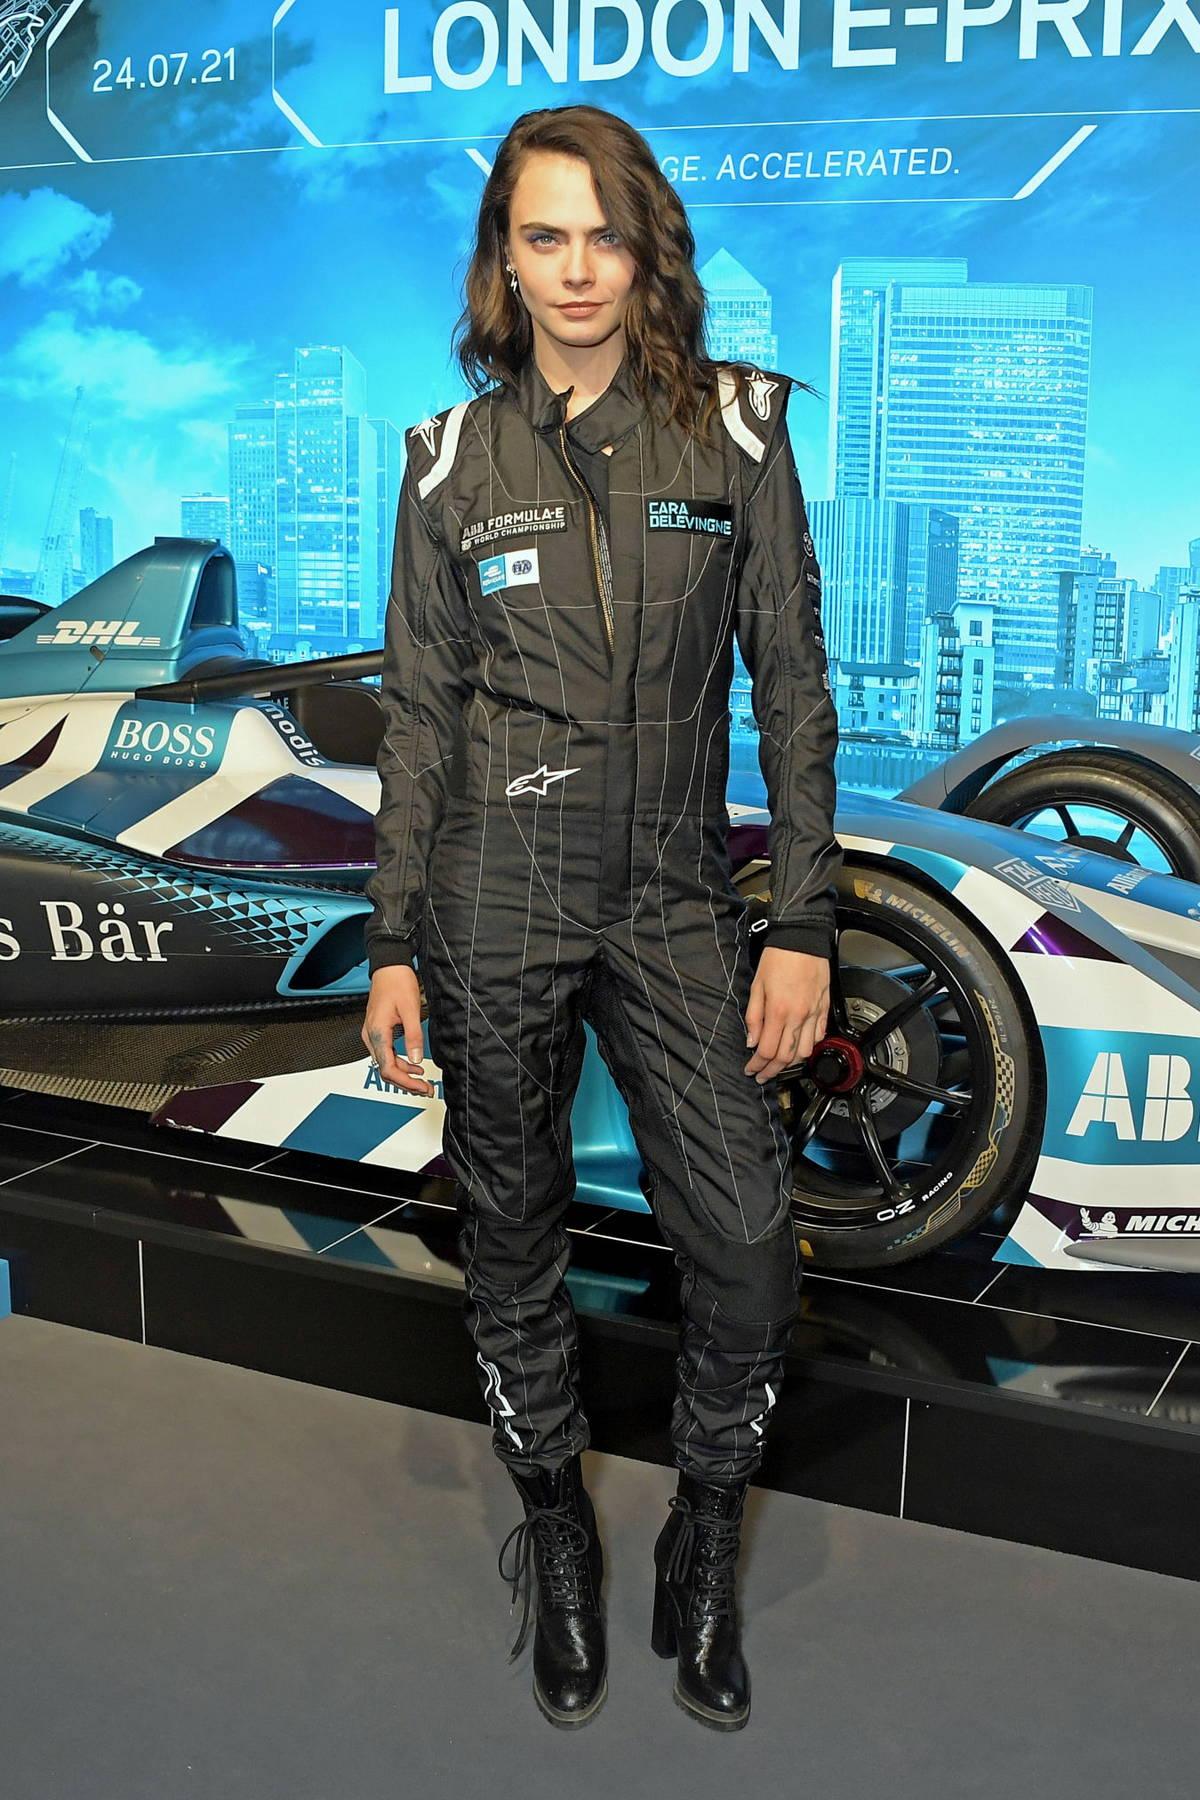 Cara Delevingne attends the ABB FIA Formula E Heineken London E-Prix at ExCel in London, UK